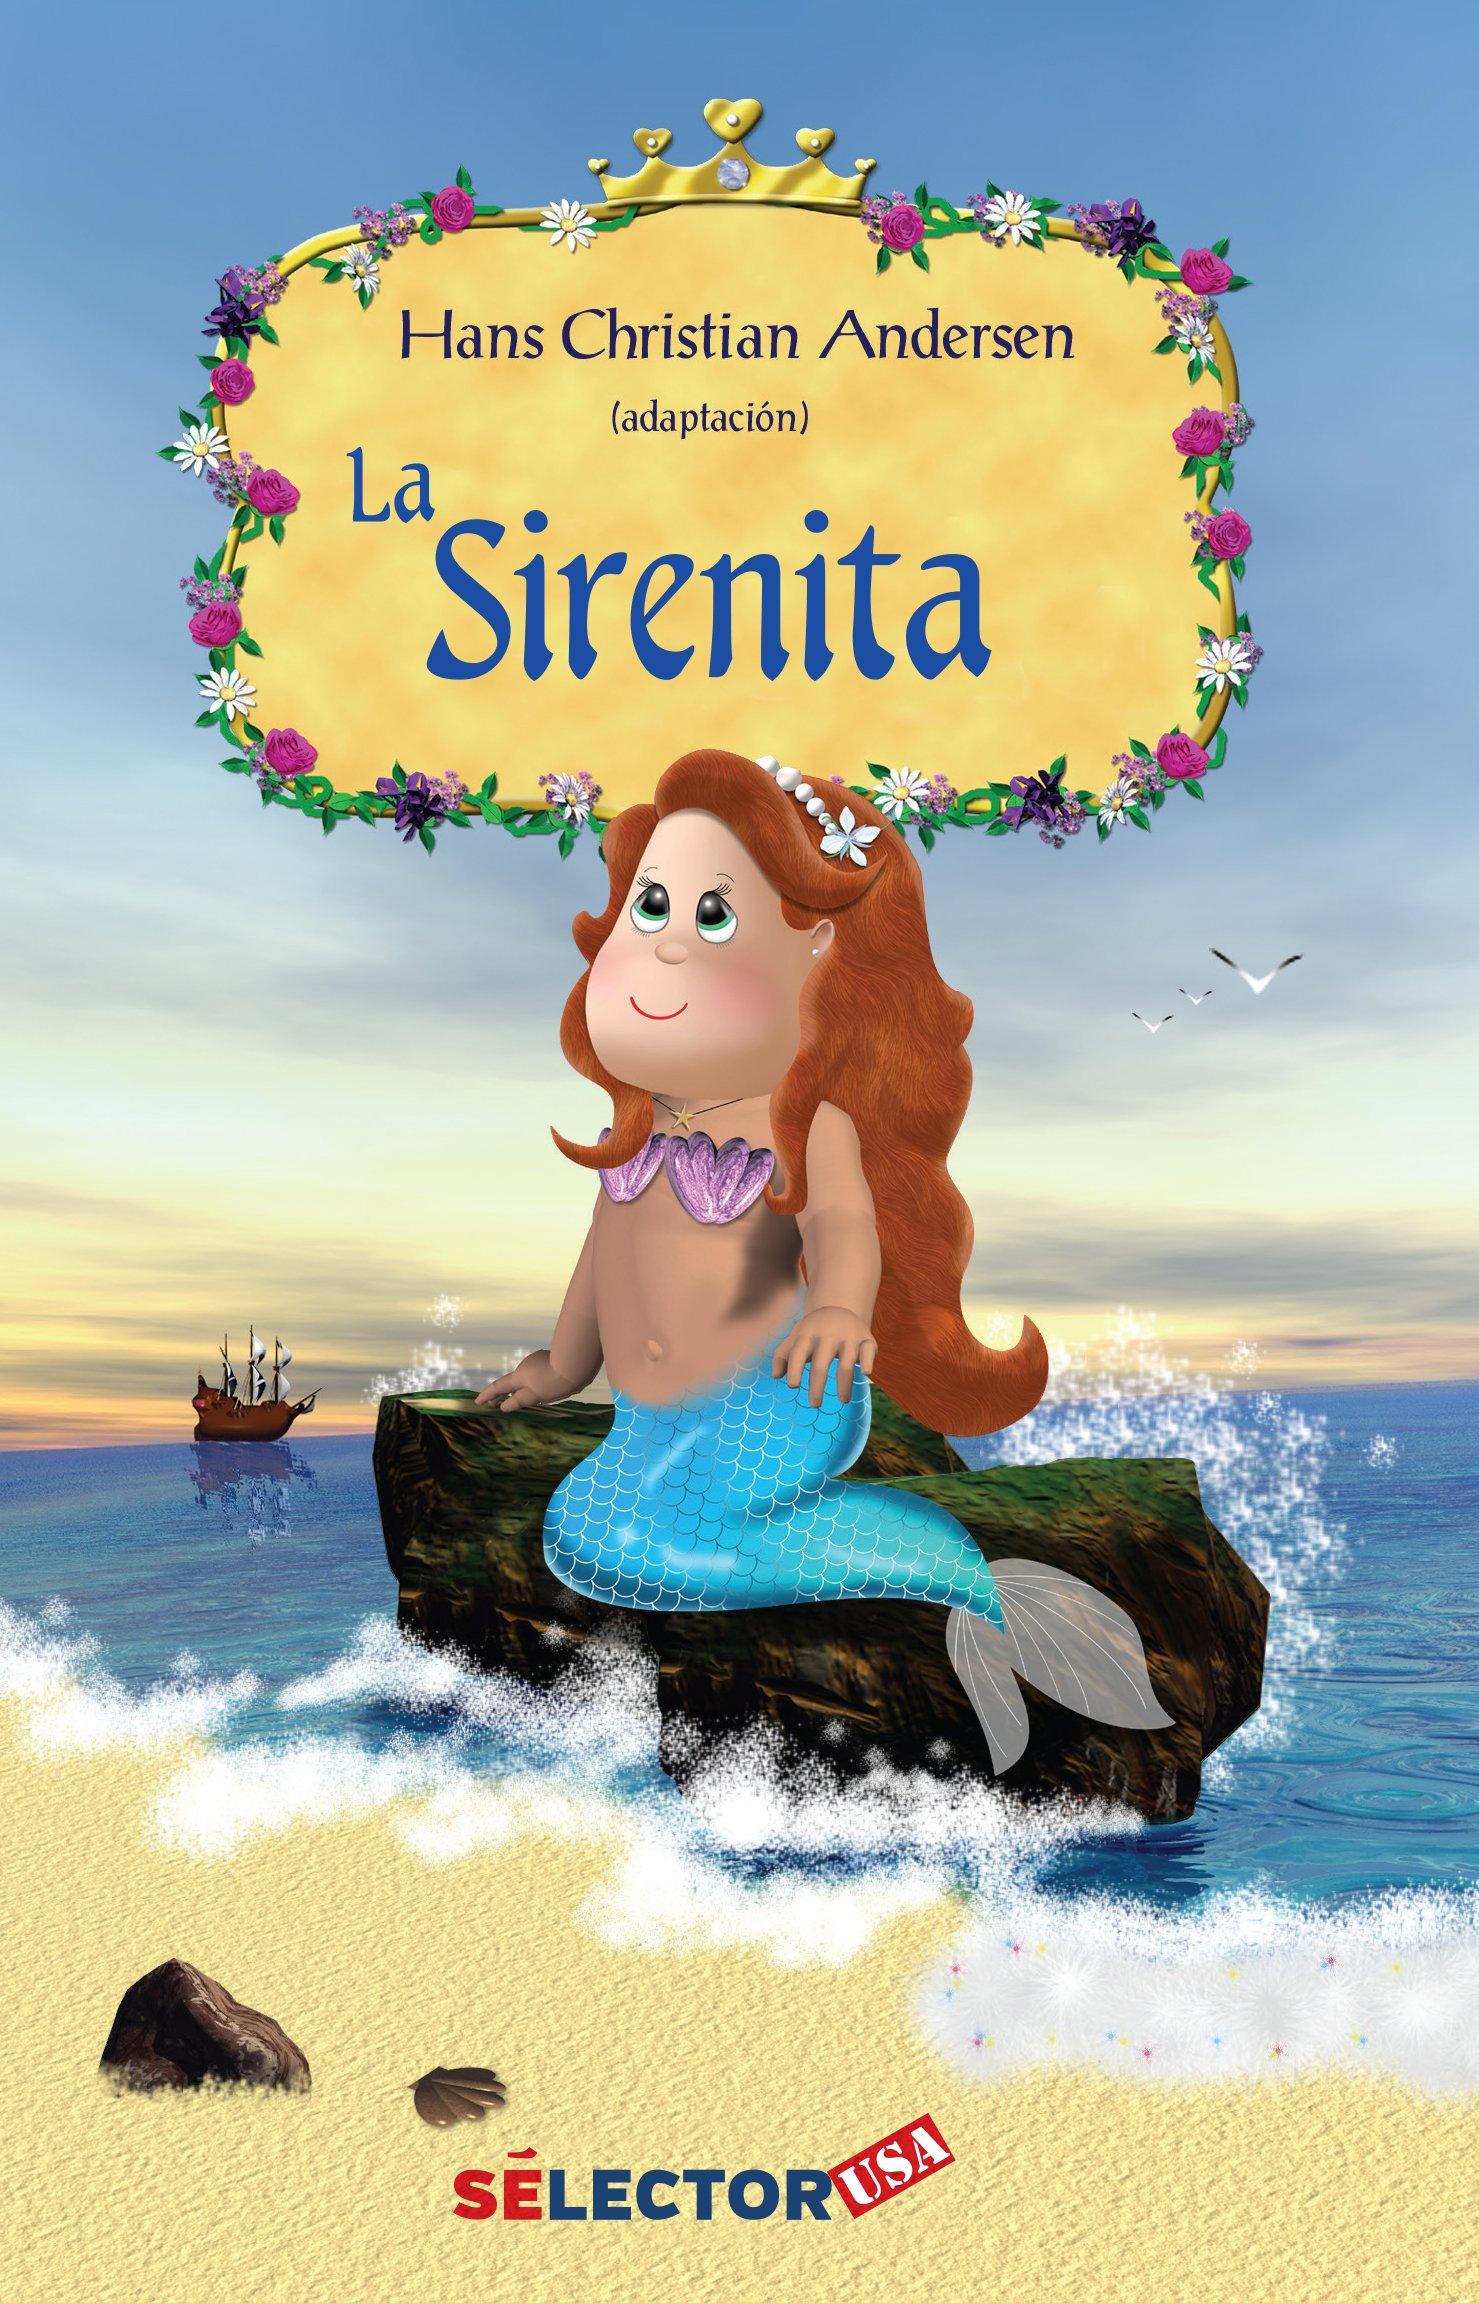 La sirenita / The Little Mermaid (Spanish Edition): Catalina Barrios Perez, Hans Christian Andersen: 9781681653594: Amazon.com: Books